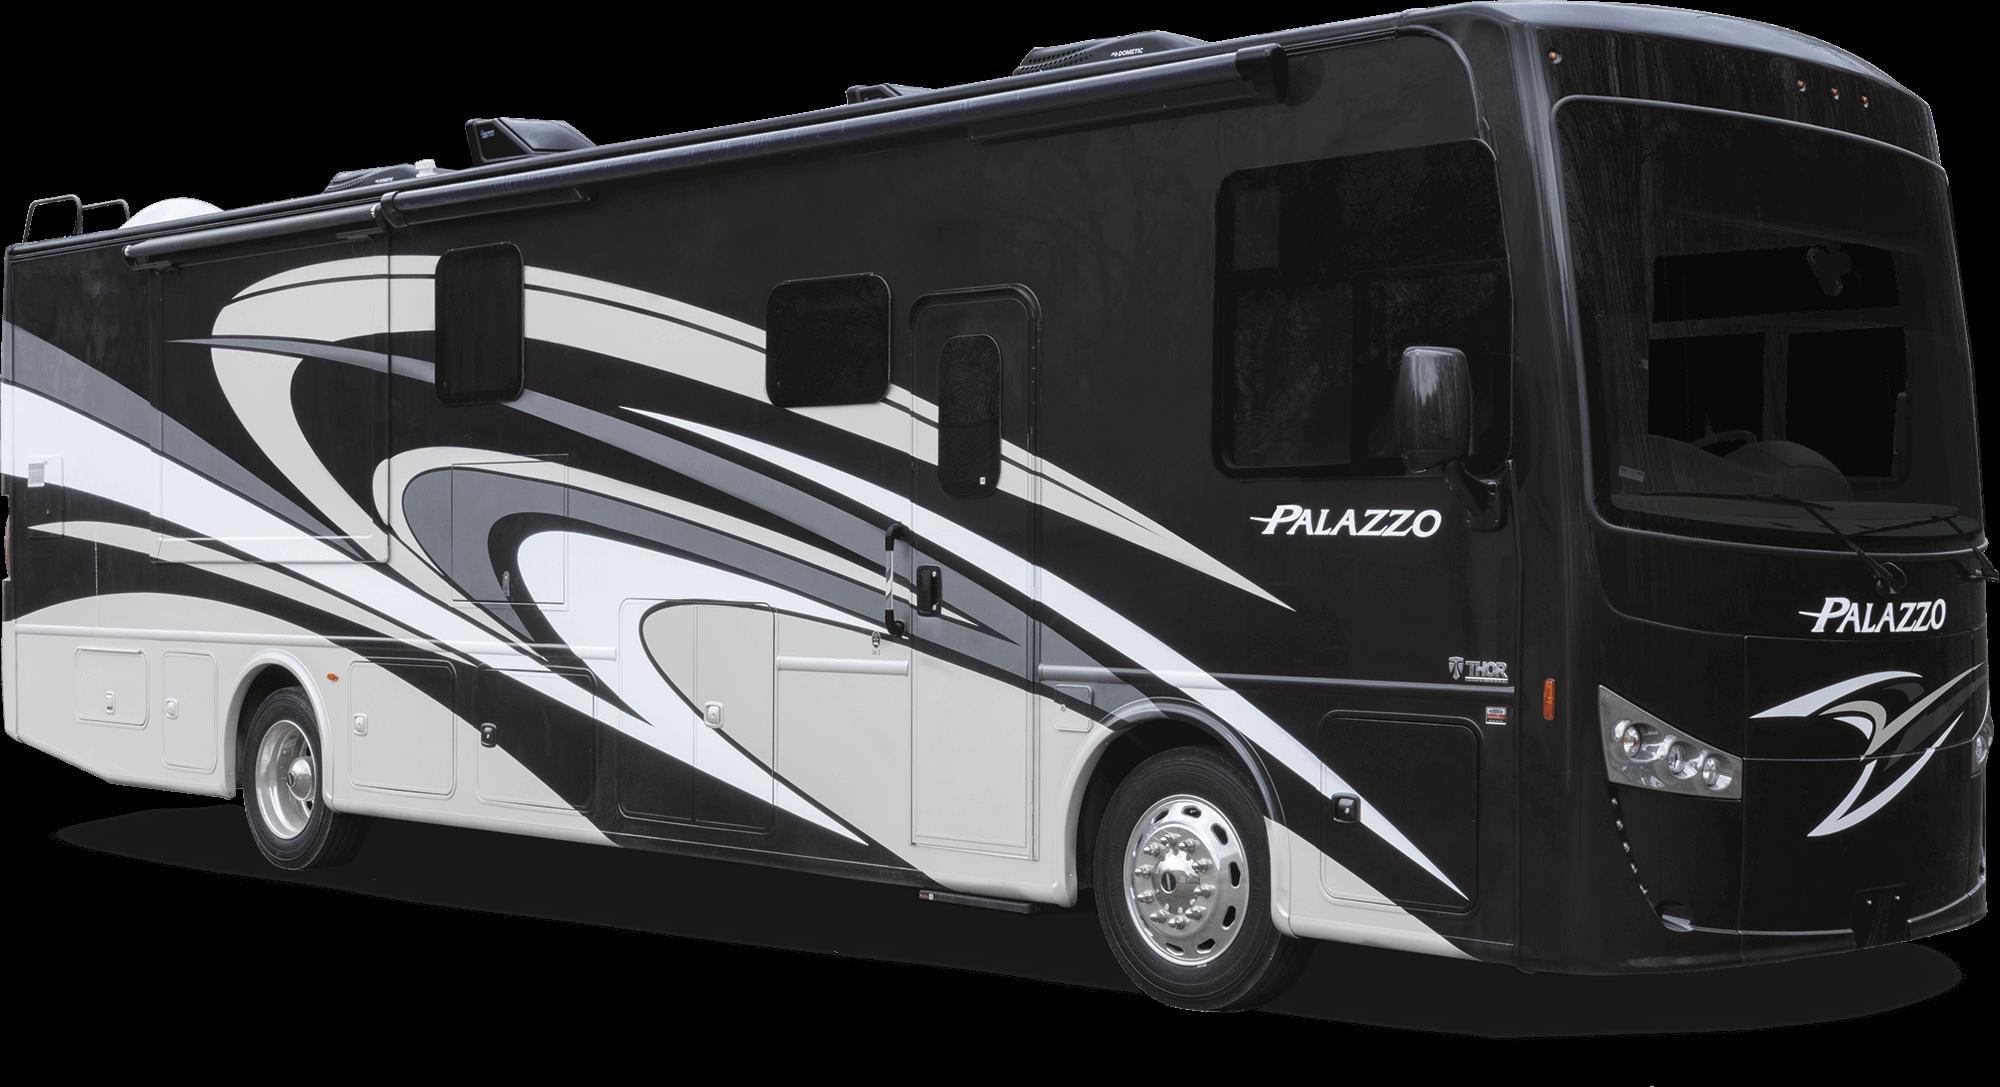 2018-palazzo-paint-streamsong-3q-36-3-3.png